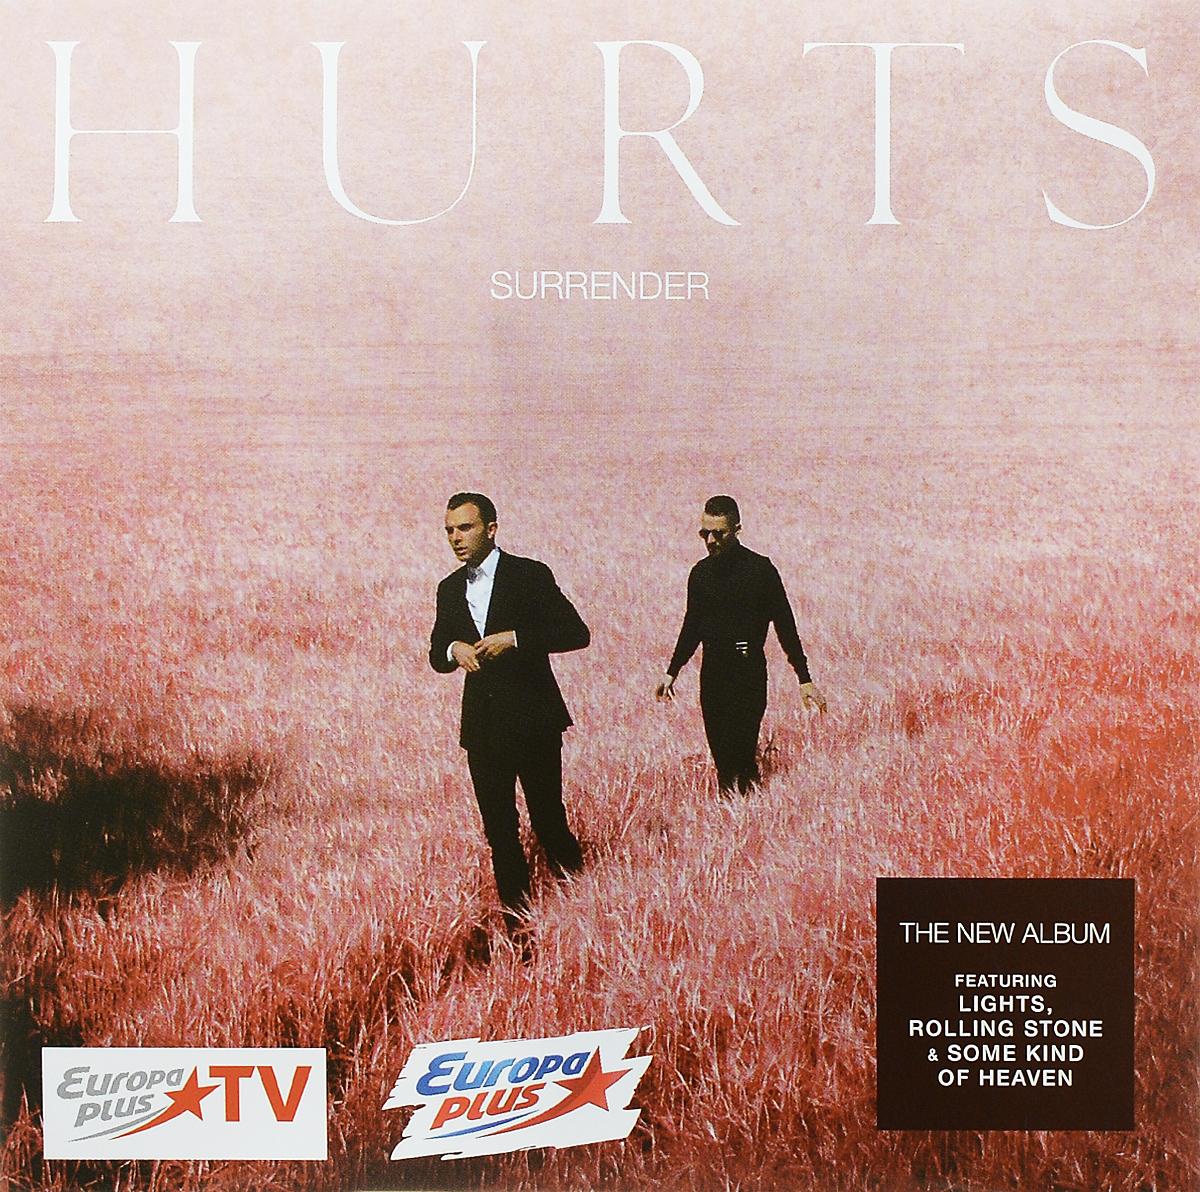 Hurts Hurts. Surrender hurts hurts surrender